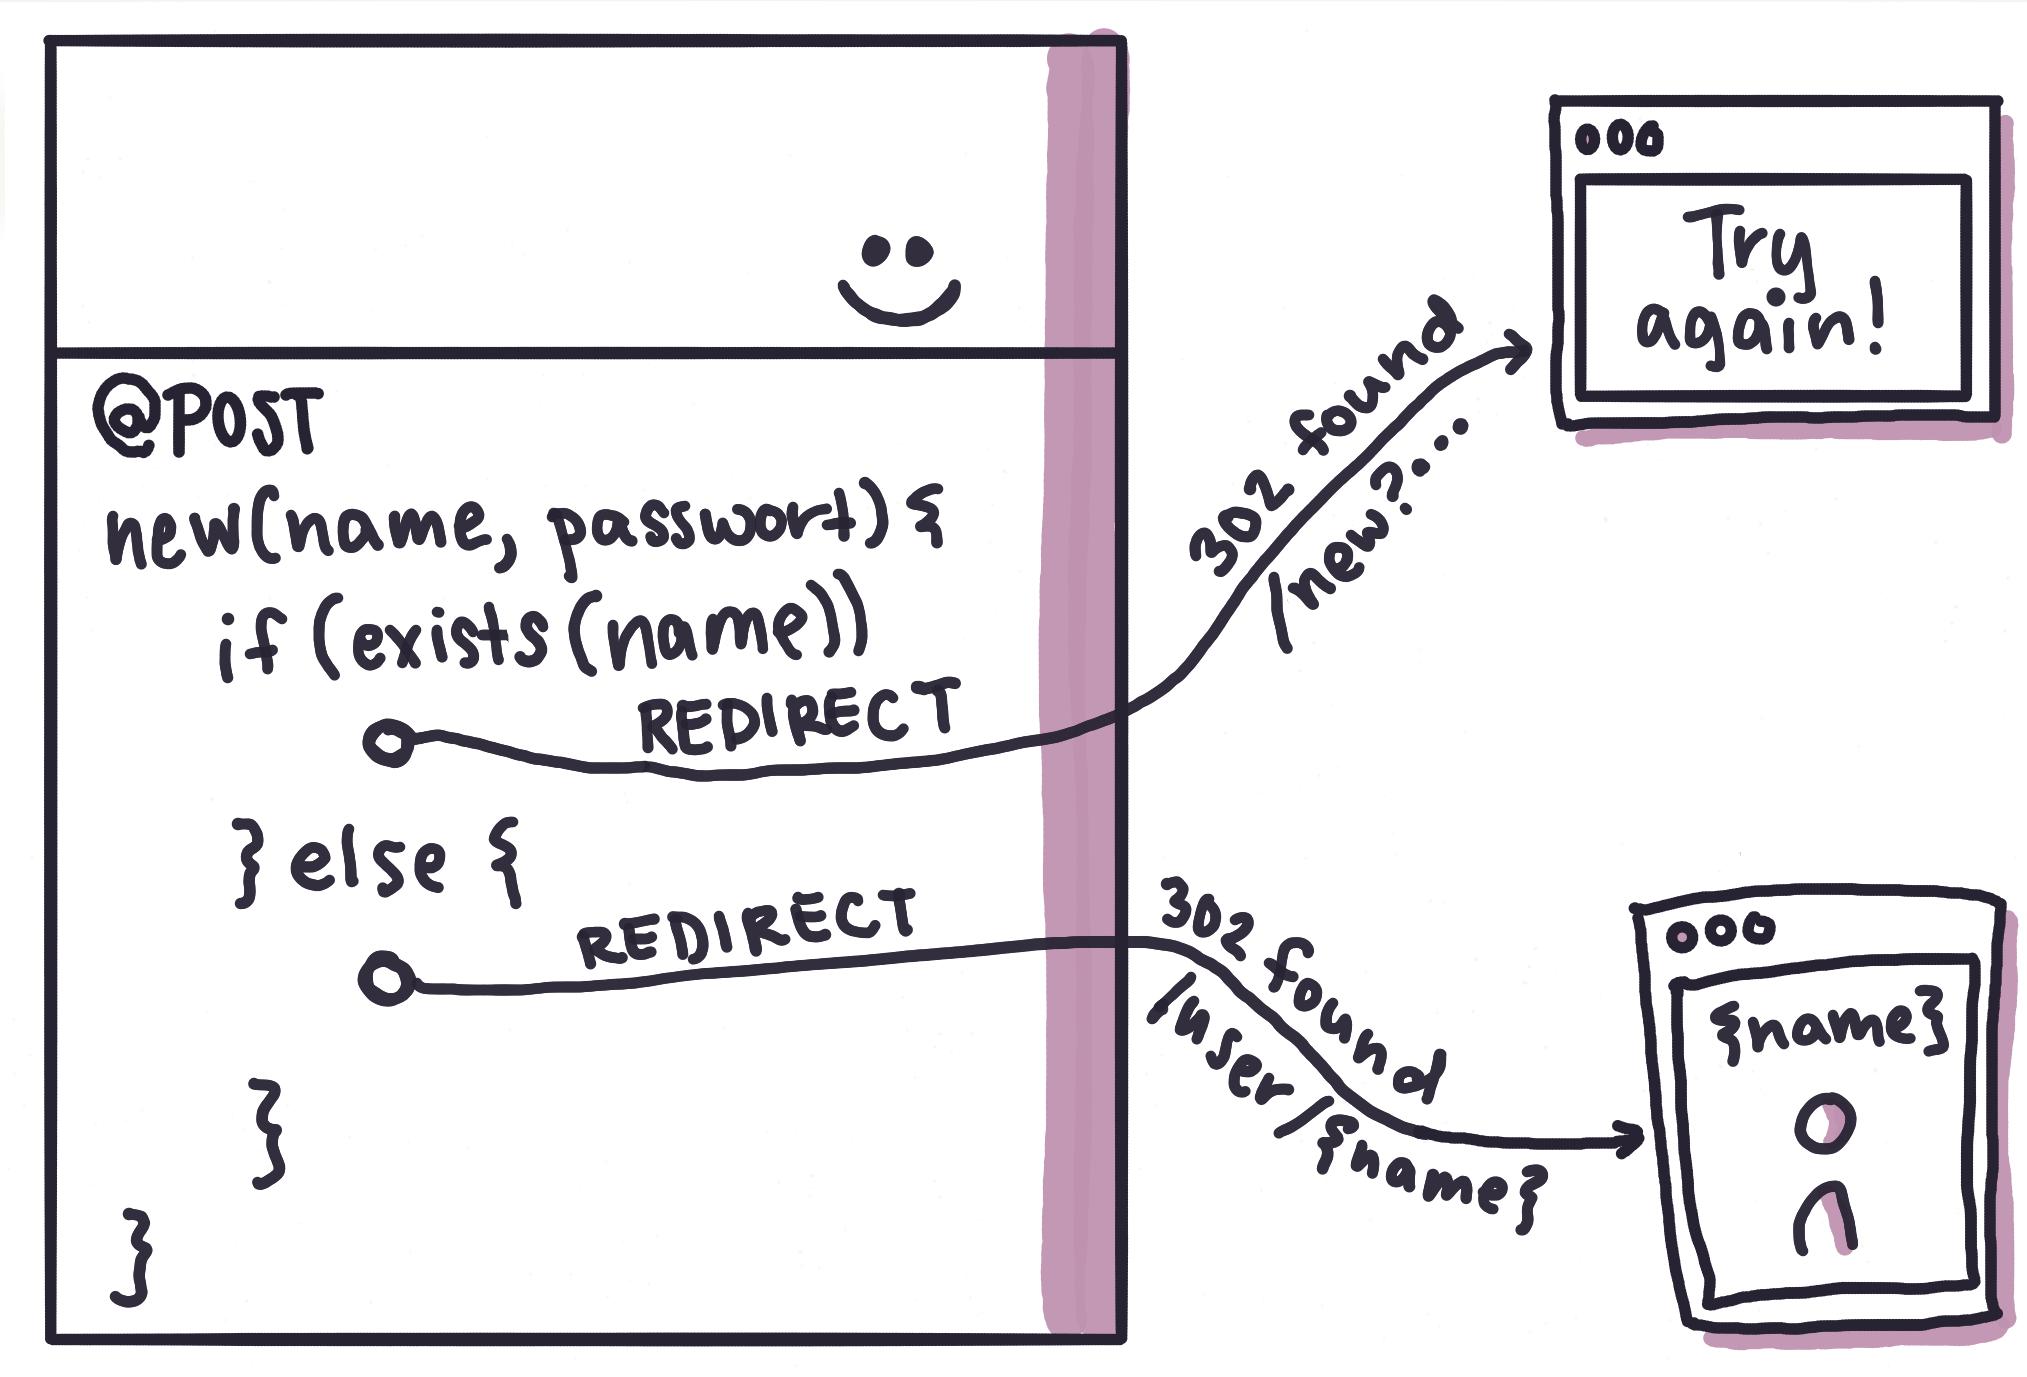 Fig. 5: The server decides what happens next